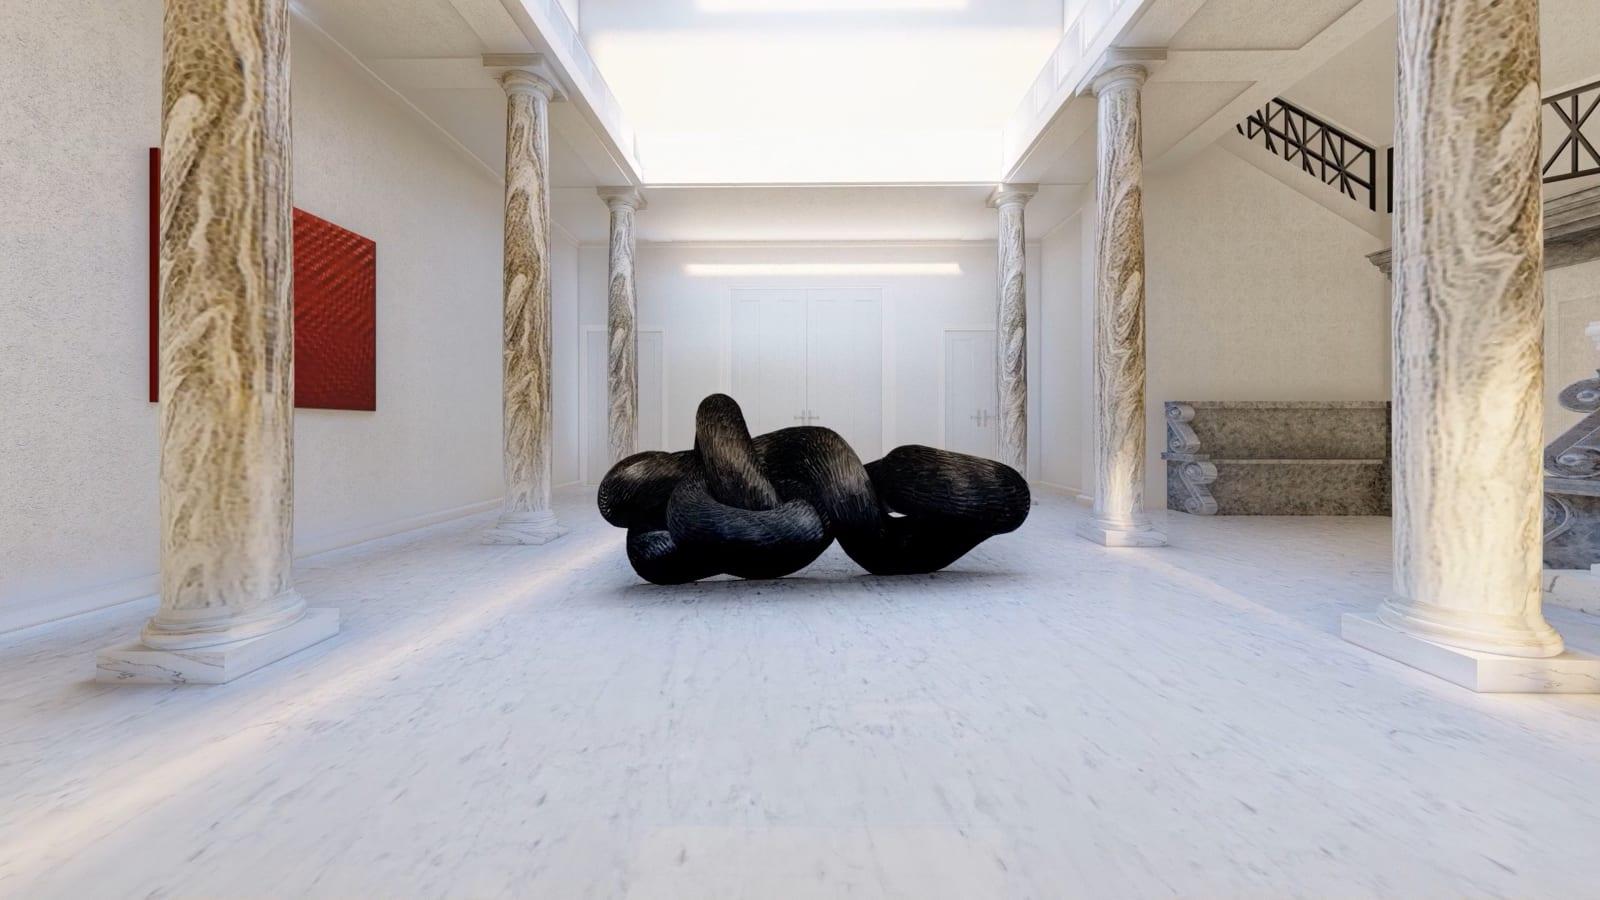 KATE MCCGWIRE Corvid, 2011 122 x 331 x 149 cm